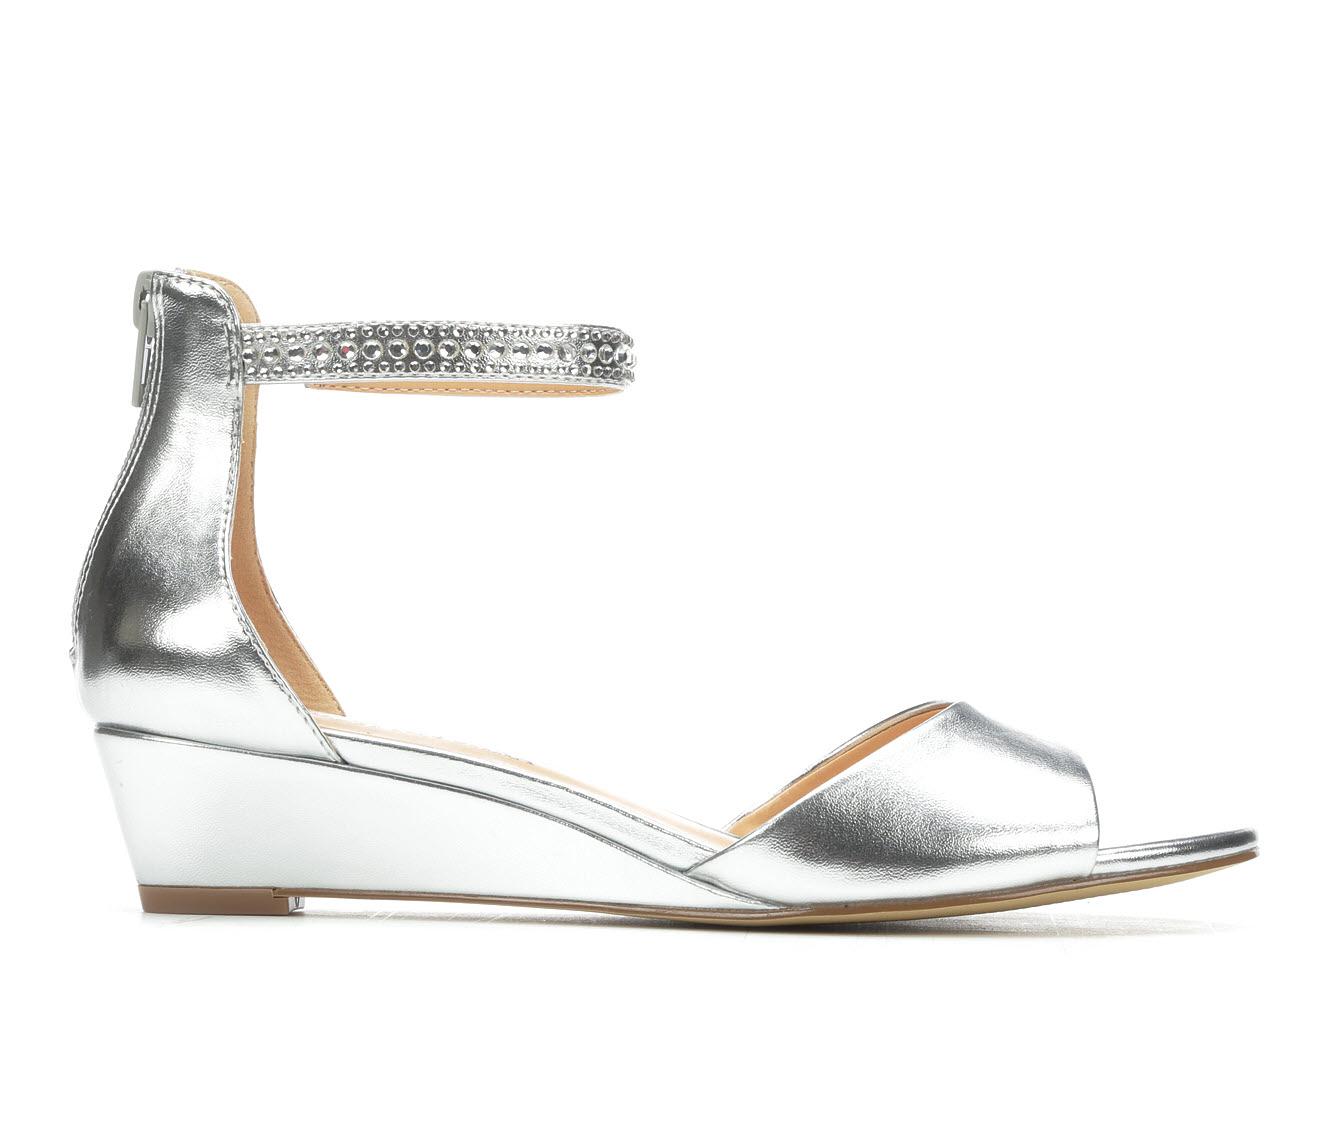 American Glamour BadgleyM Xena Women's Dress Shoe (Silver Canvas)